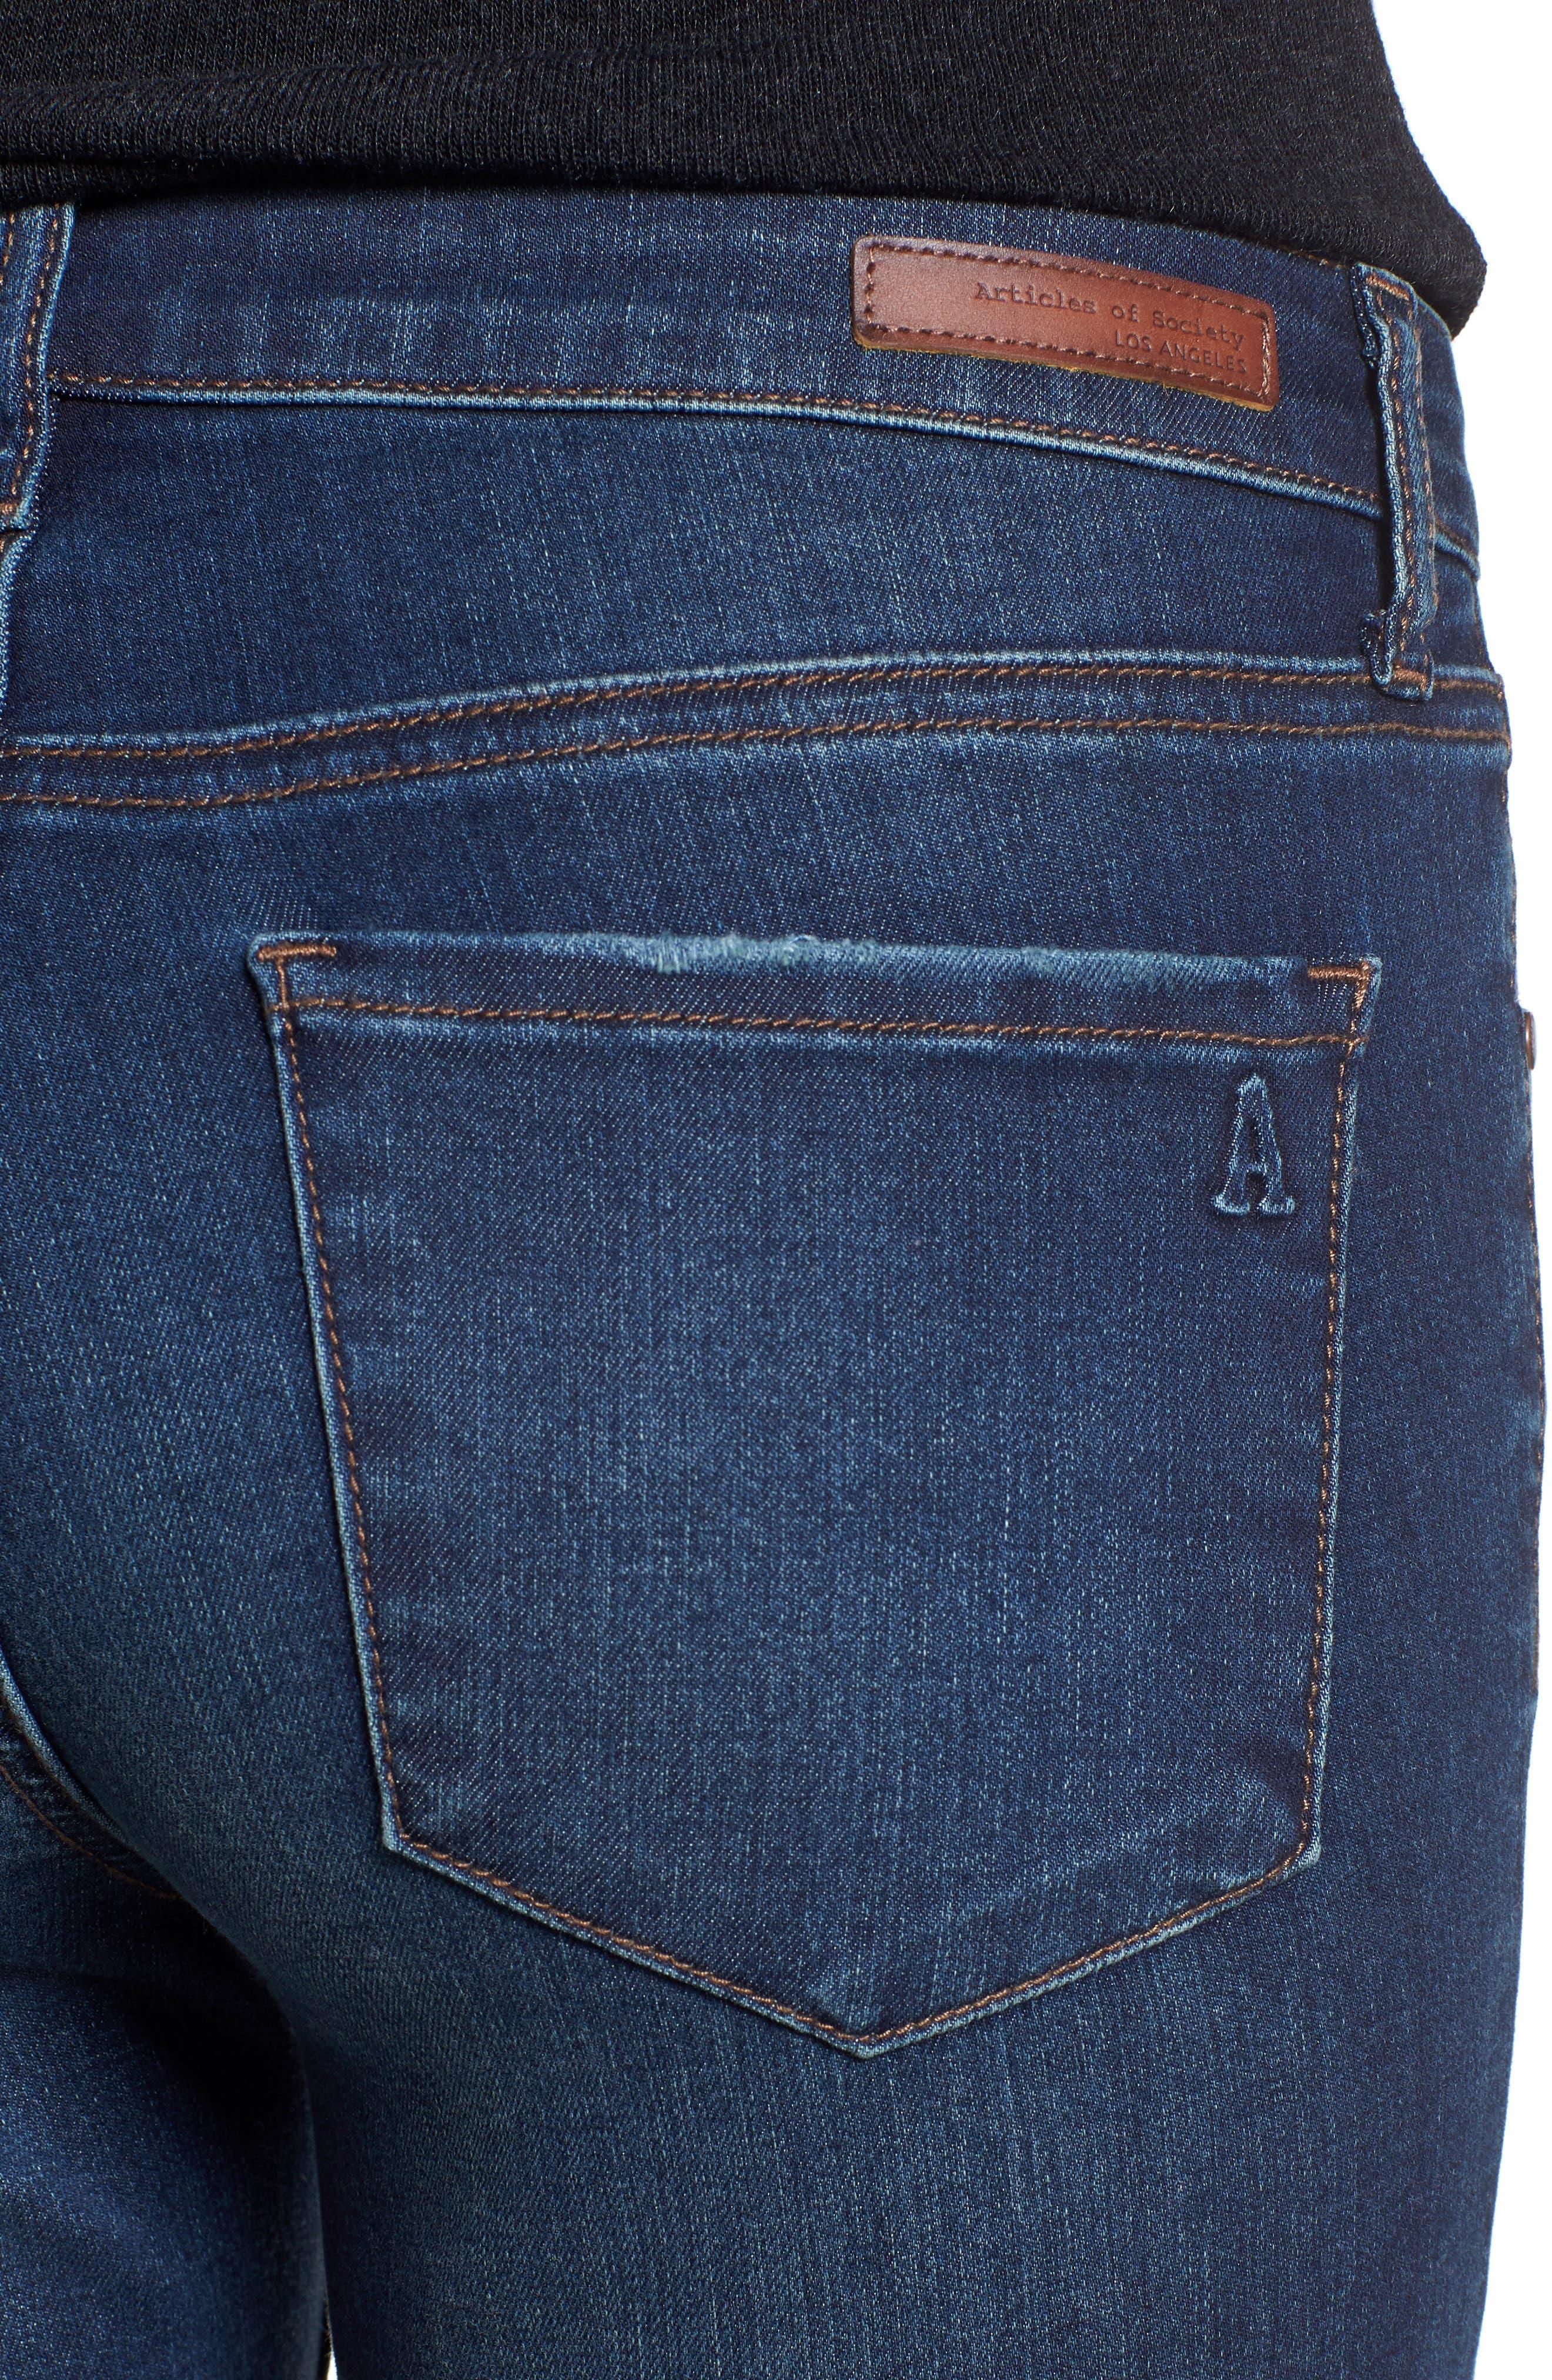 Sarah Skinny Jeans,                             Alternate thumbnail 4, color,                             SILVER LAKE